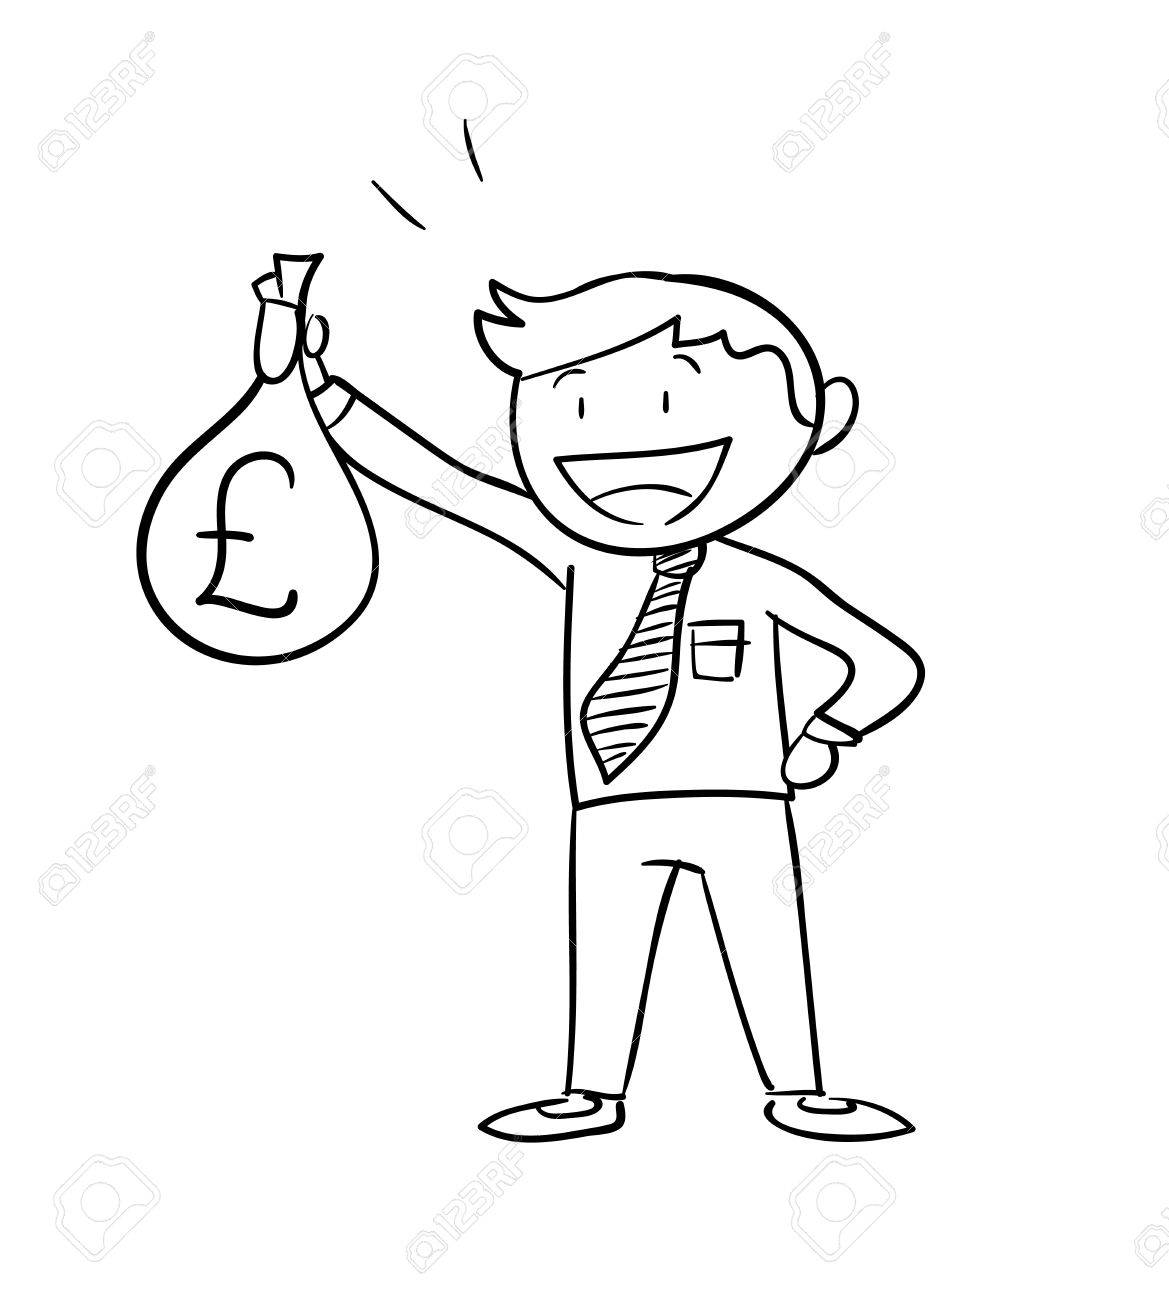 1169x1300 Man Holding Money Bag Pound, A Hand Drawn Vector Illustration